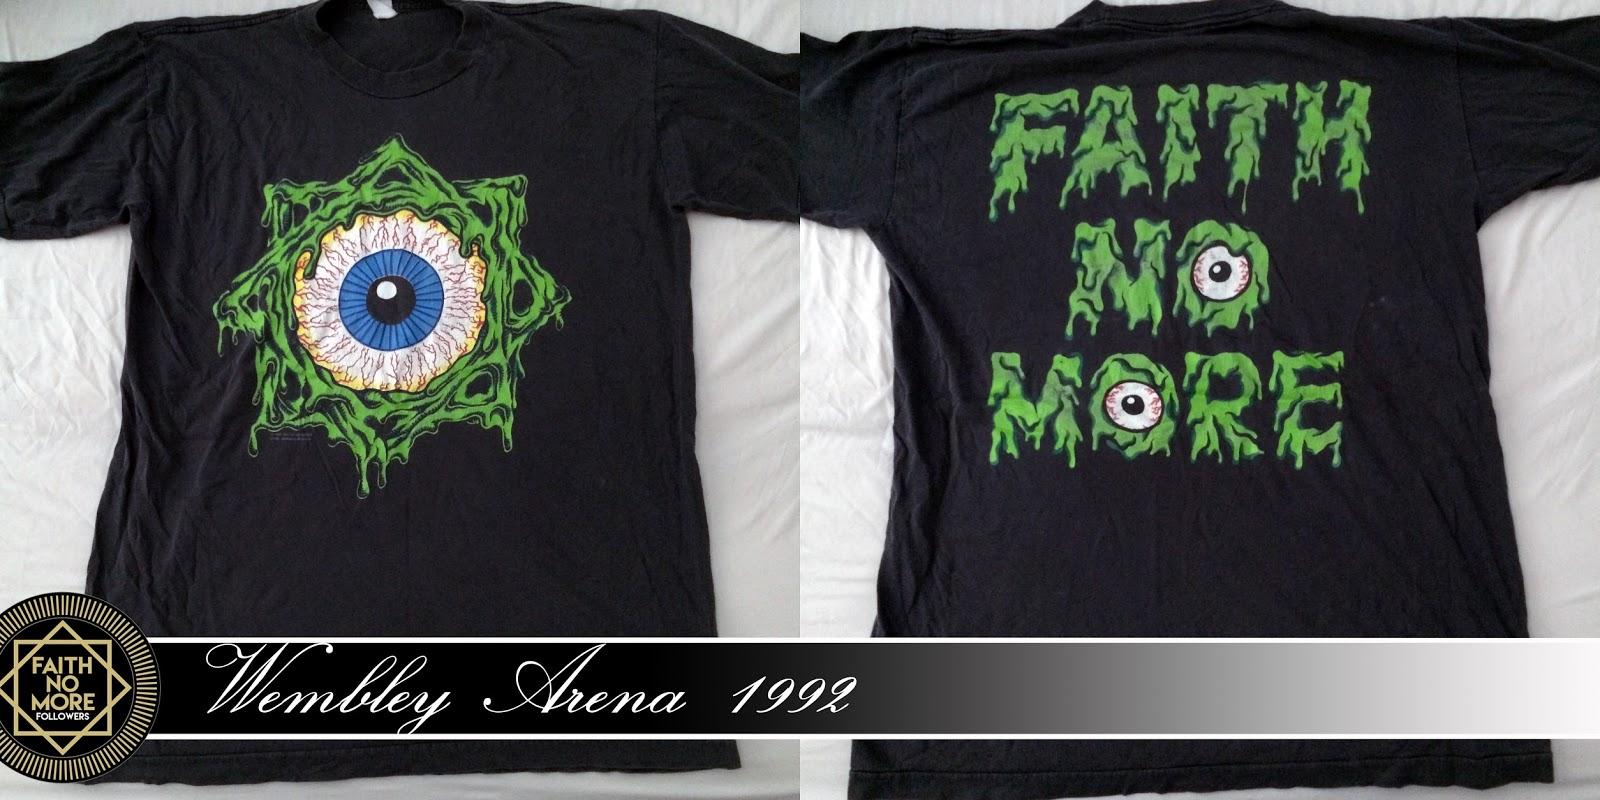 low priced 1af86 e37ff New York Giants T Shirt Ebay